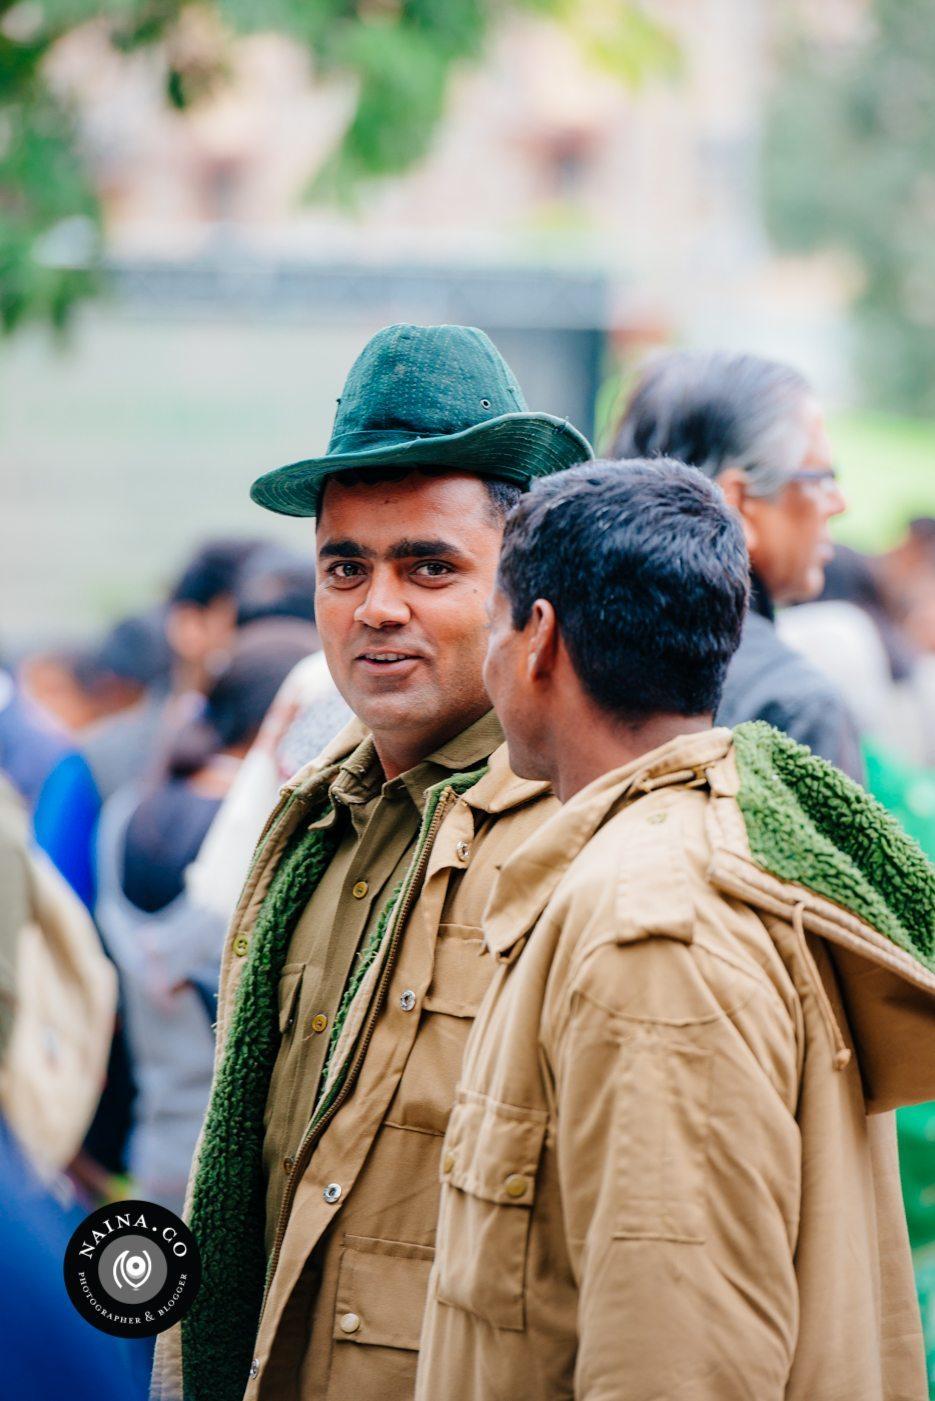 Naina.co-Raconteuse-Visuelle-Photographer-Blogger-Storyteller-Luxury-Lifestyle-January-2015-Jaipur-Literature-Festival-StRegis-LeMeridien-ZeeJLF-EyesForStreetStyle-09